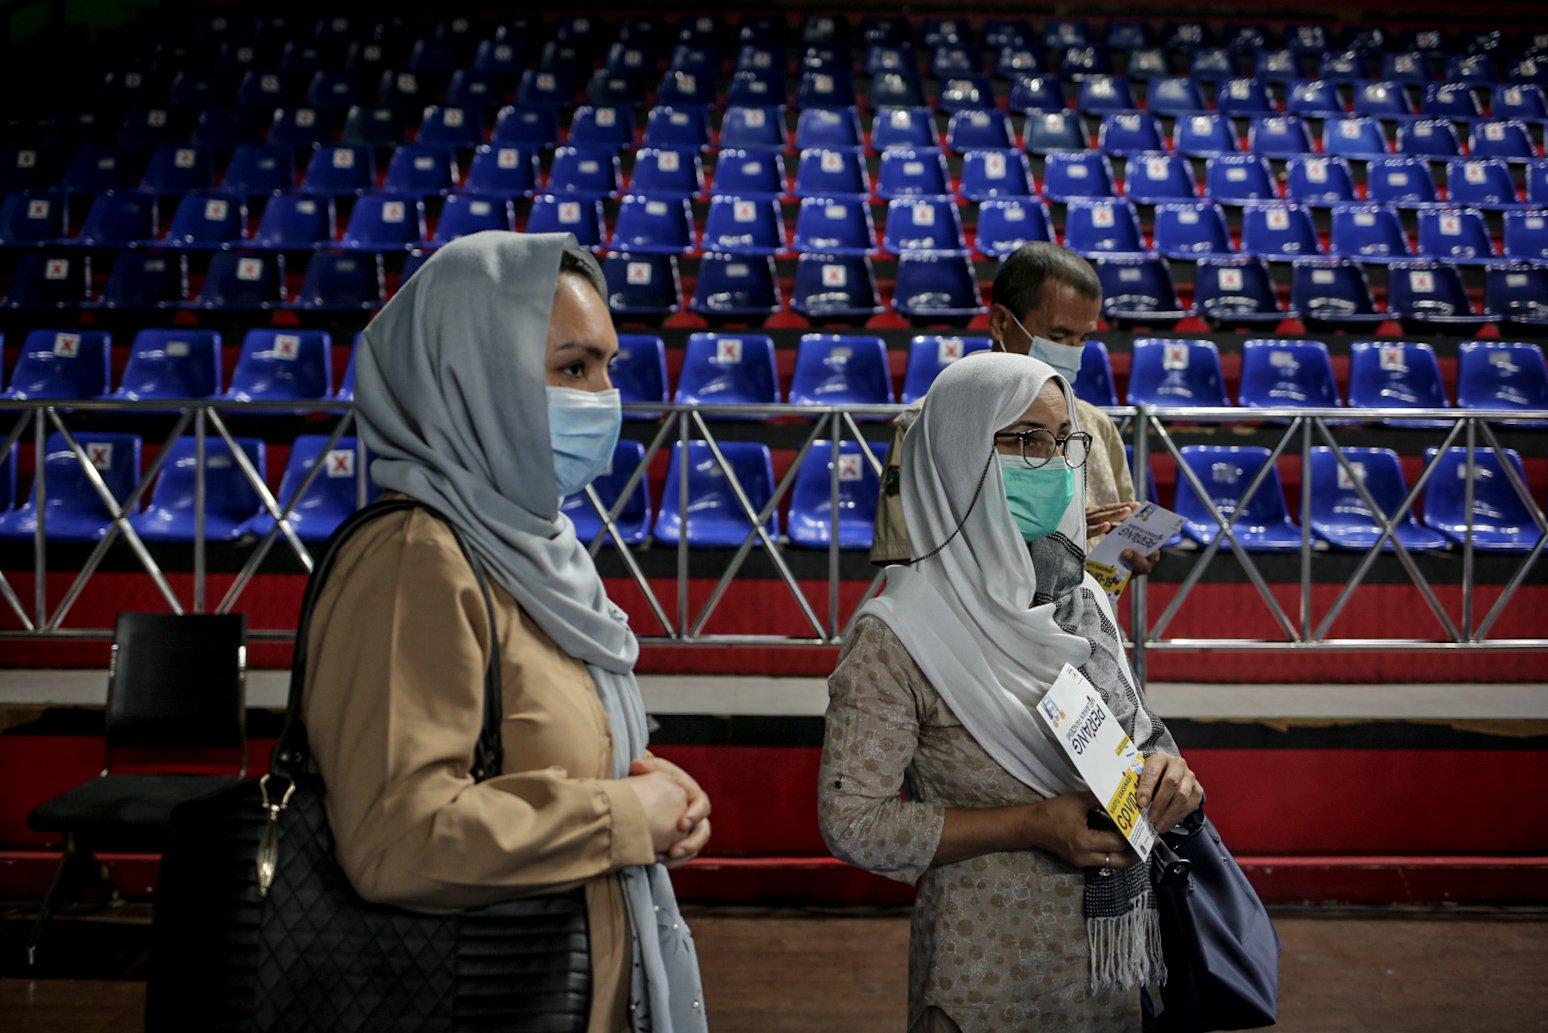 Pencari suaka berbaris antre saat mengikuti vaksinasi COVID-19 di GOR Bulungan, Jakarta Selatan, Kamis (7/10/2021). \r\nVaksinasi tersebut digelar atas kerja sama Pemprov DKI Jakarta, UNHCR dan Kadin Indonesia. \r\nSebanyak 600 vaksin dosis pertama disediakan dalam vaksinasi tersebut.